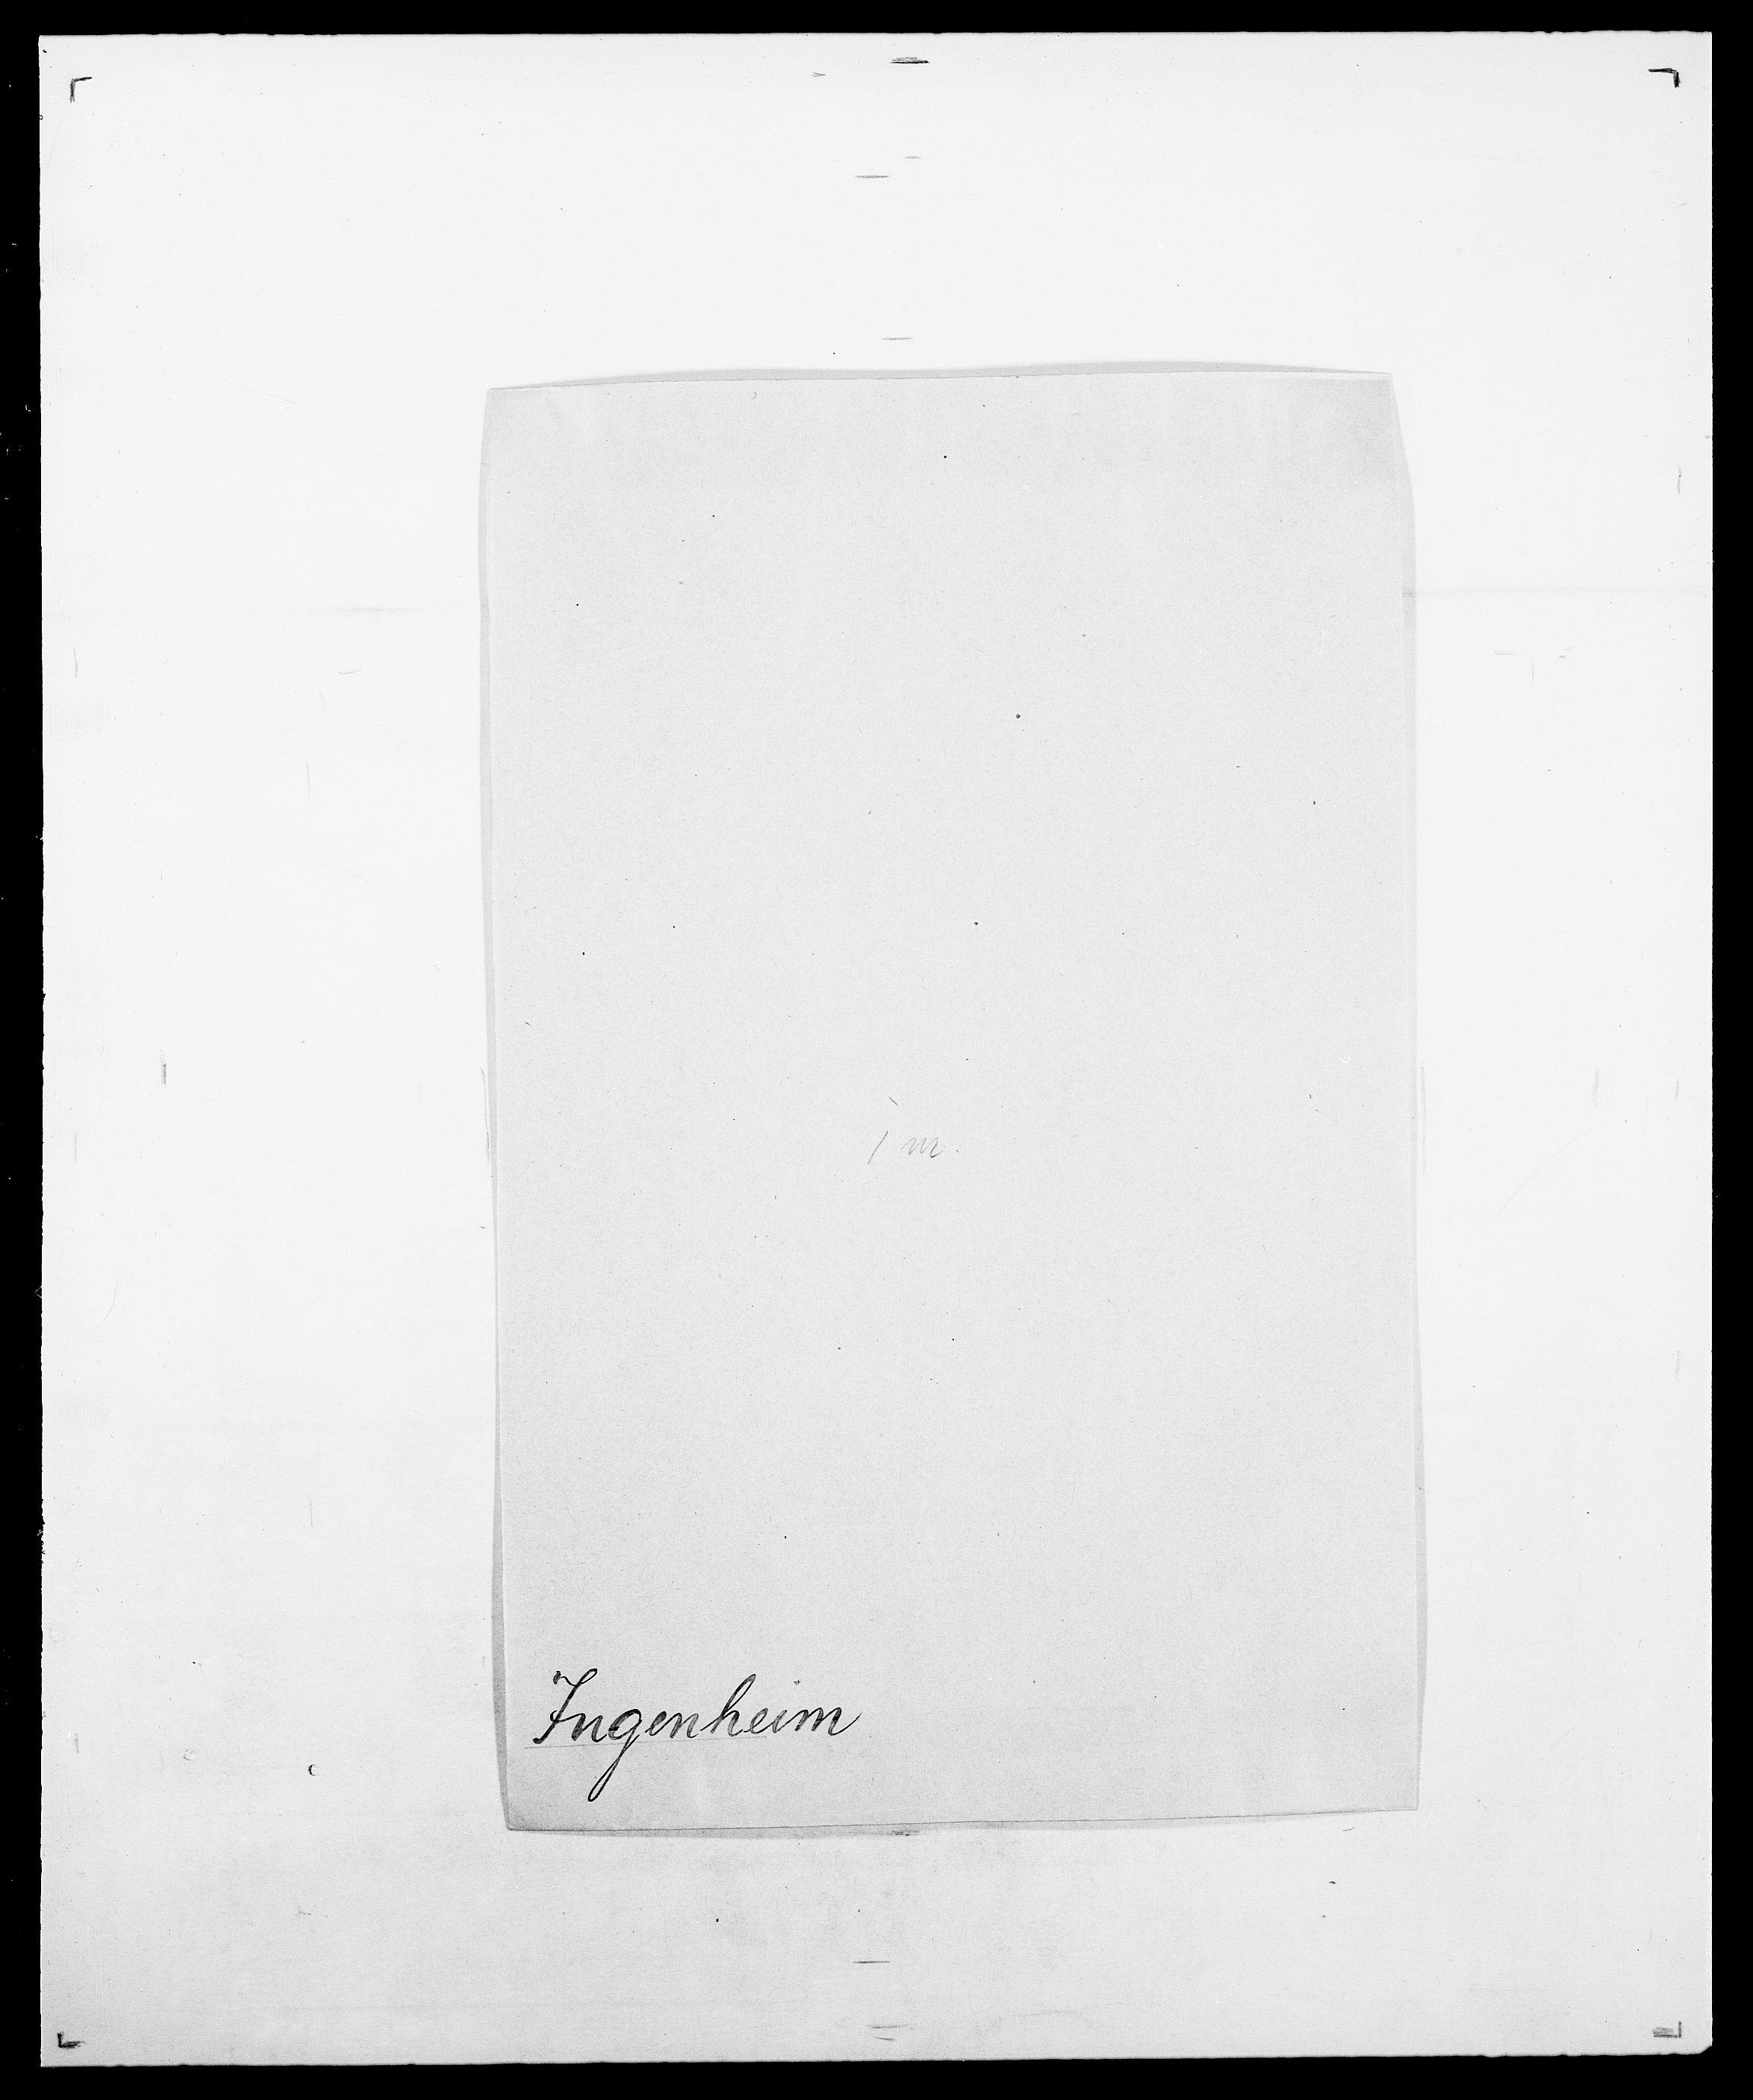 SAO, Delgobe, Charles Antoine - samling, D/Da/L0019: van der Hude - Joys, s. 786